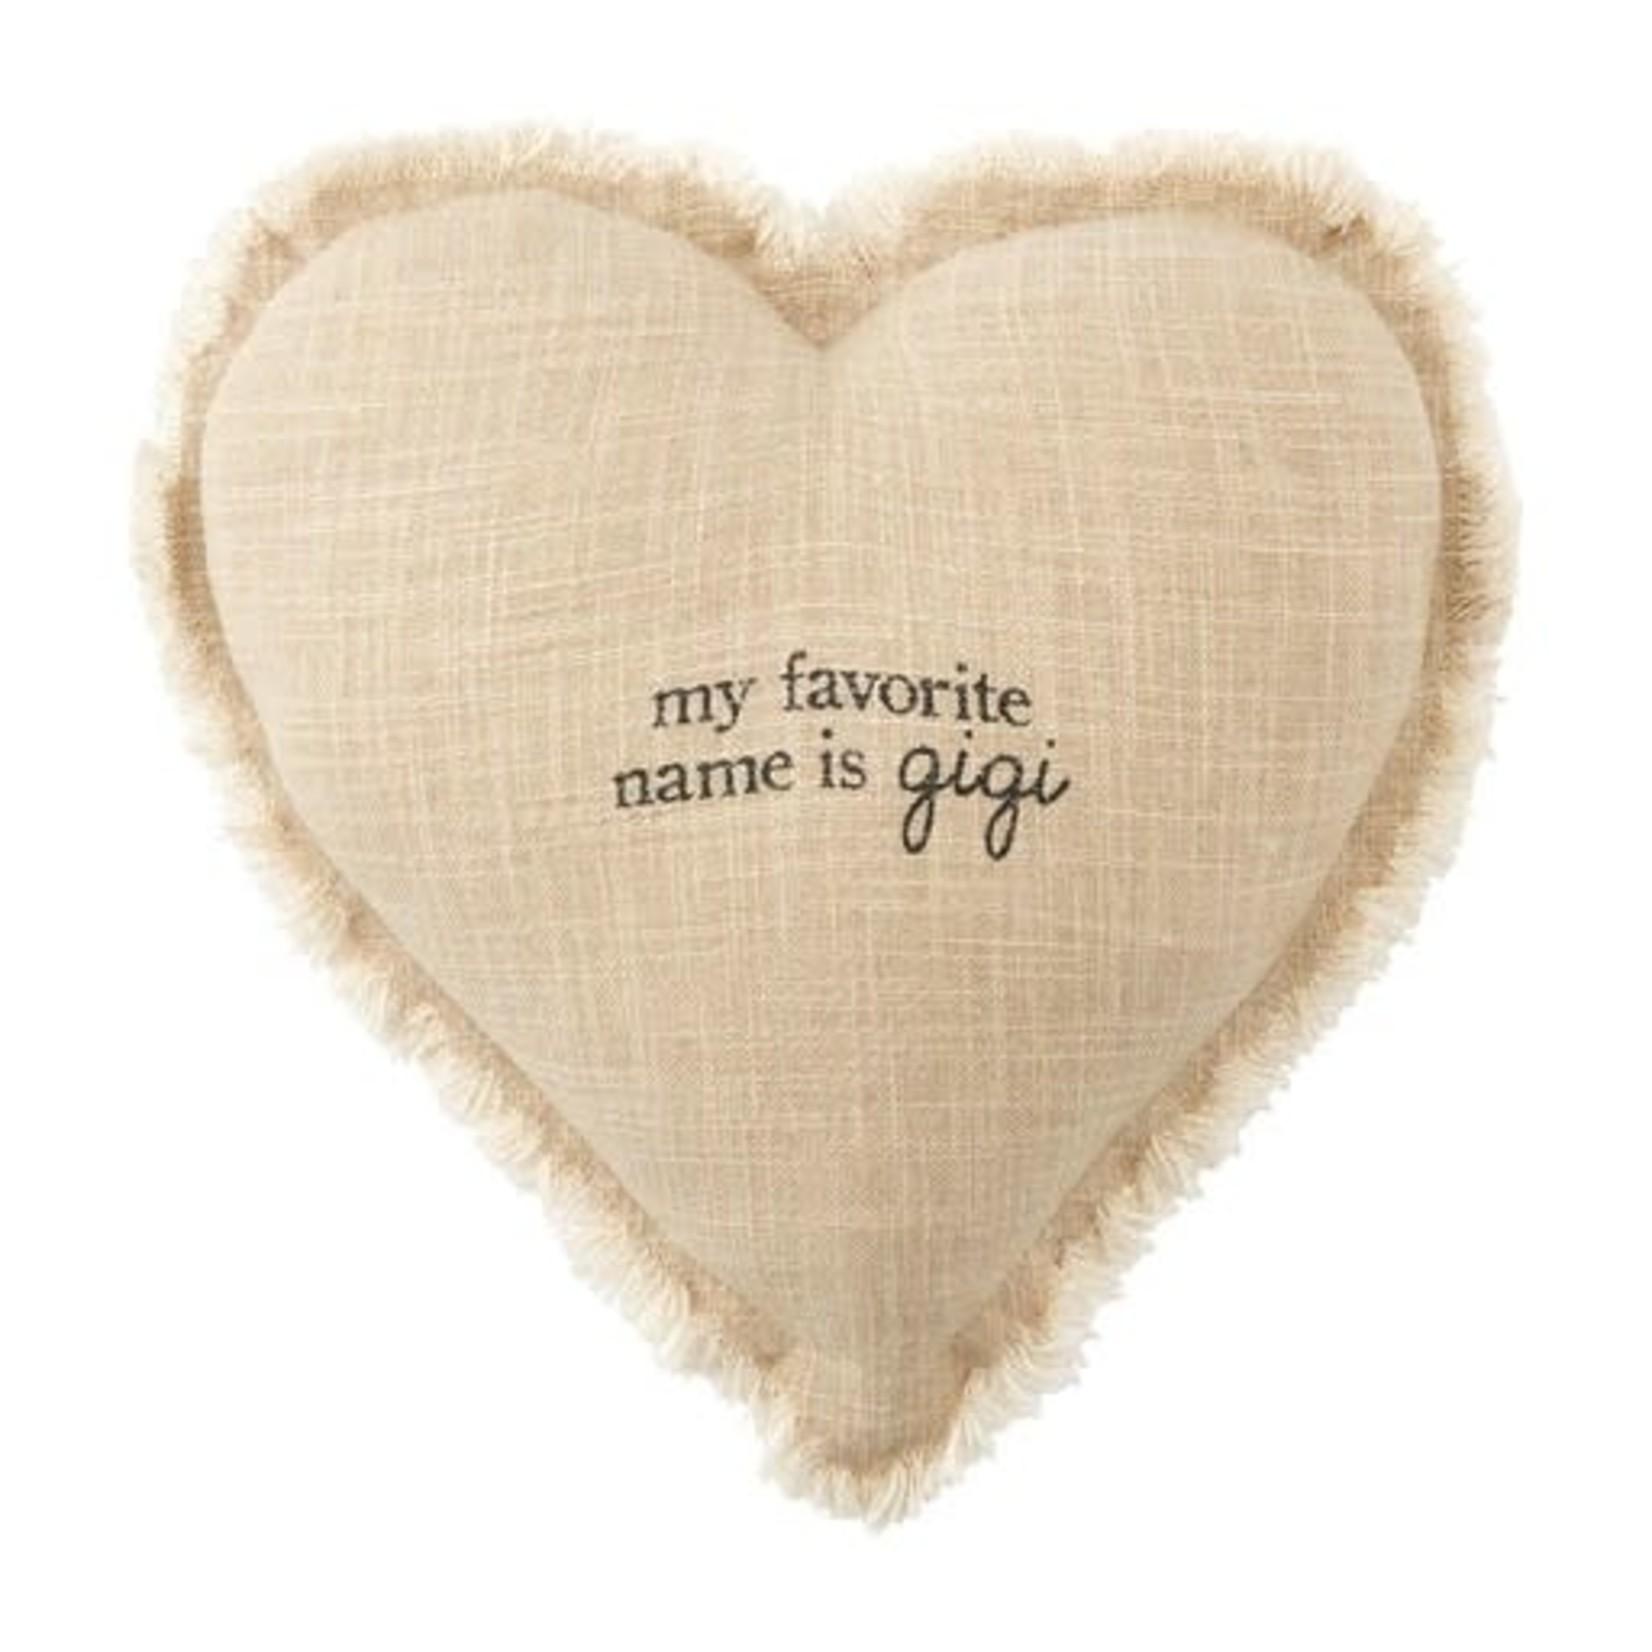 Mud Pie Grandma Heart Pillow, Gigi